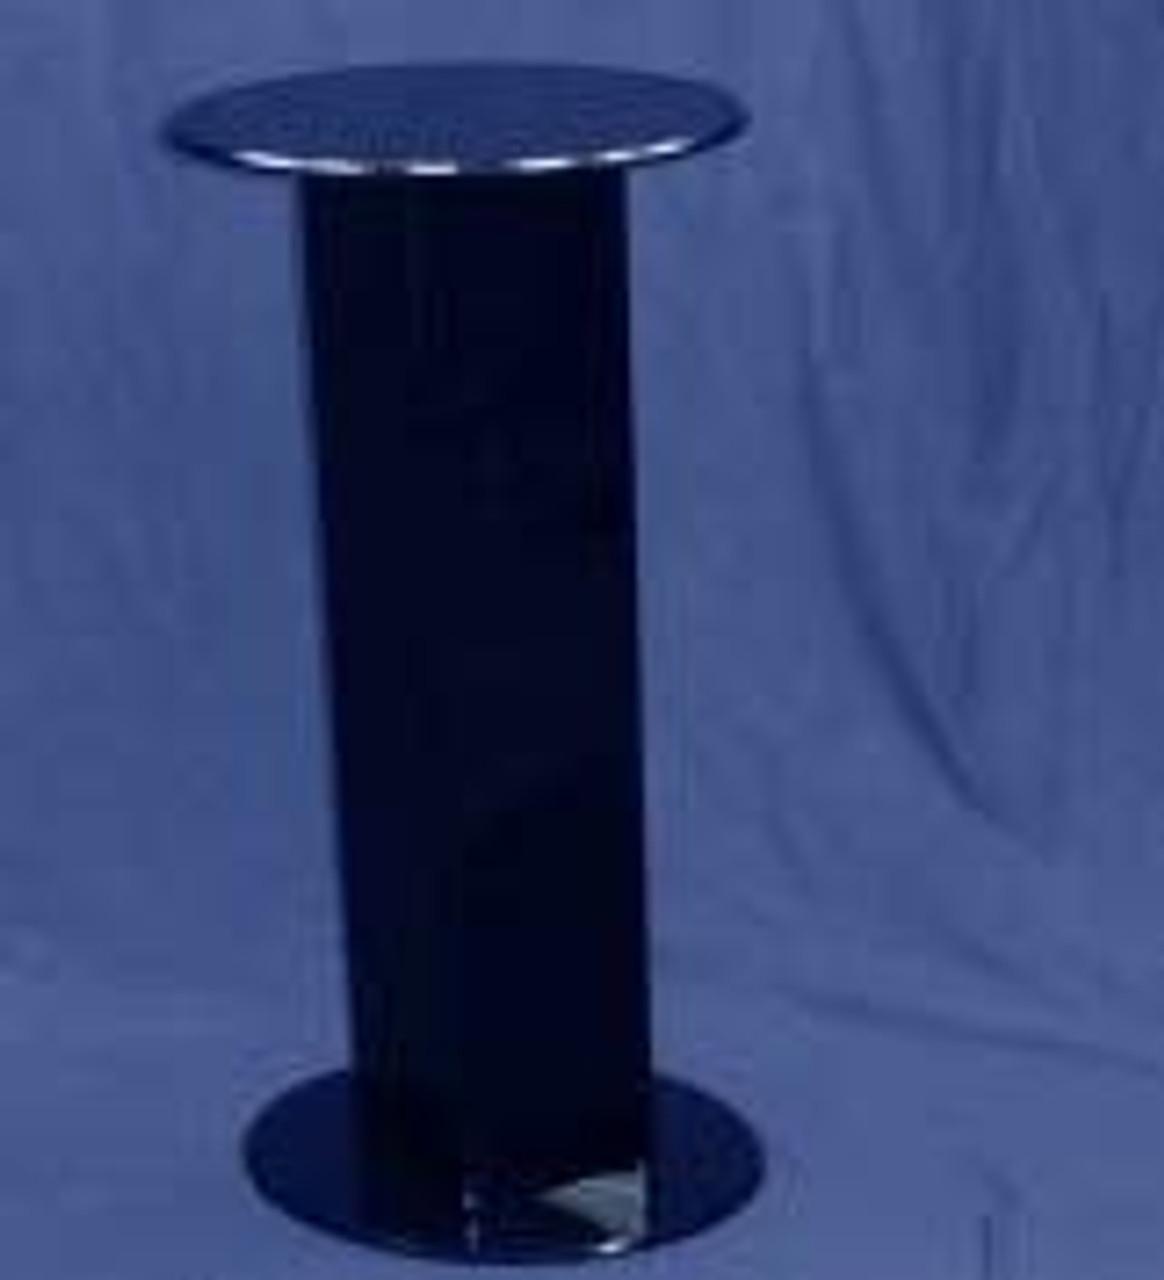 Oval Acrylic Pedestal, 30 Inch, Black